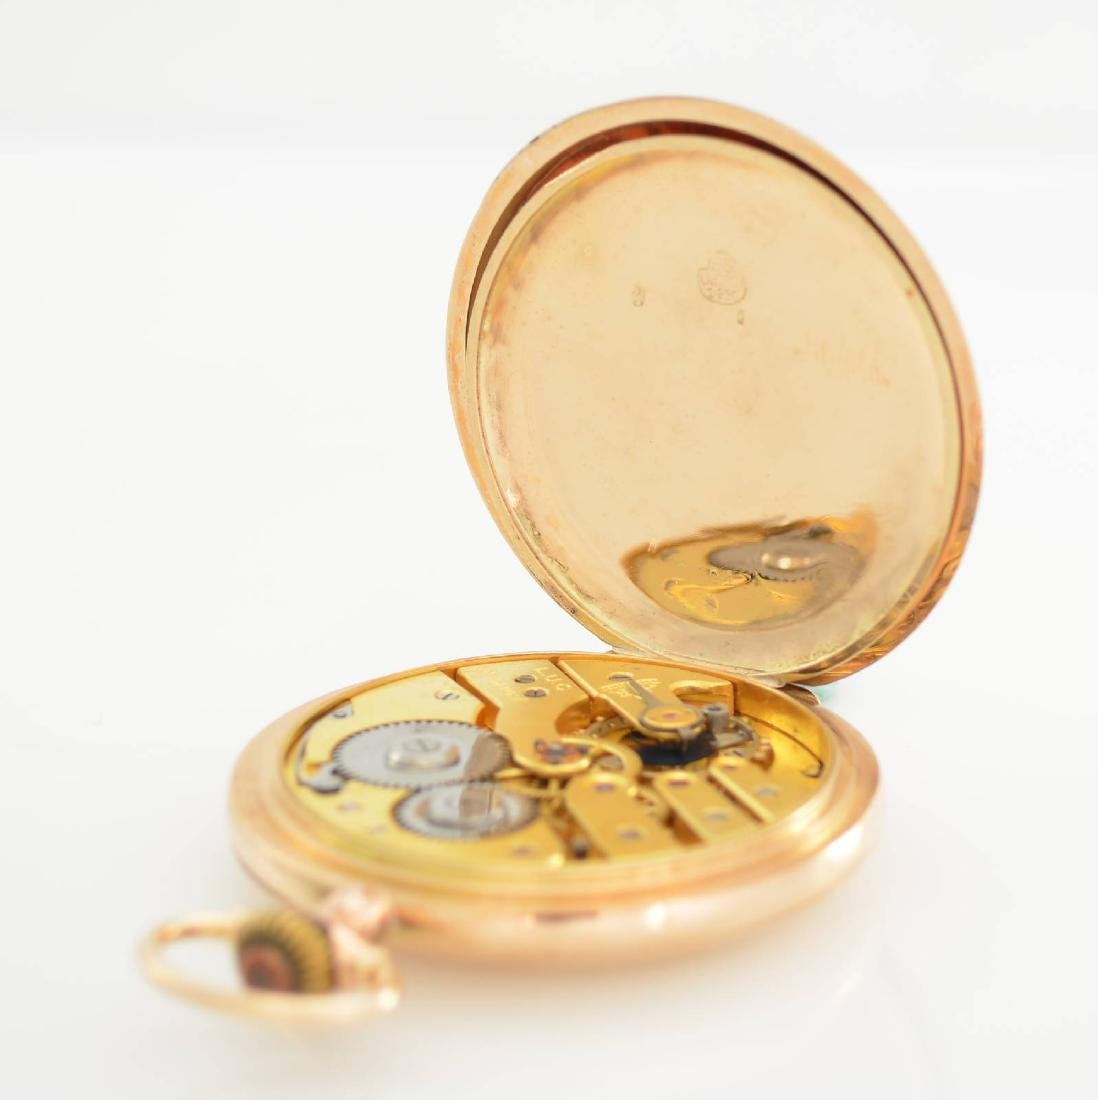 L.U.C. Chopard 14k pink gold pocket watch - 7